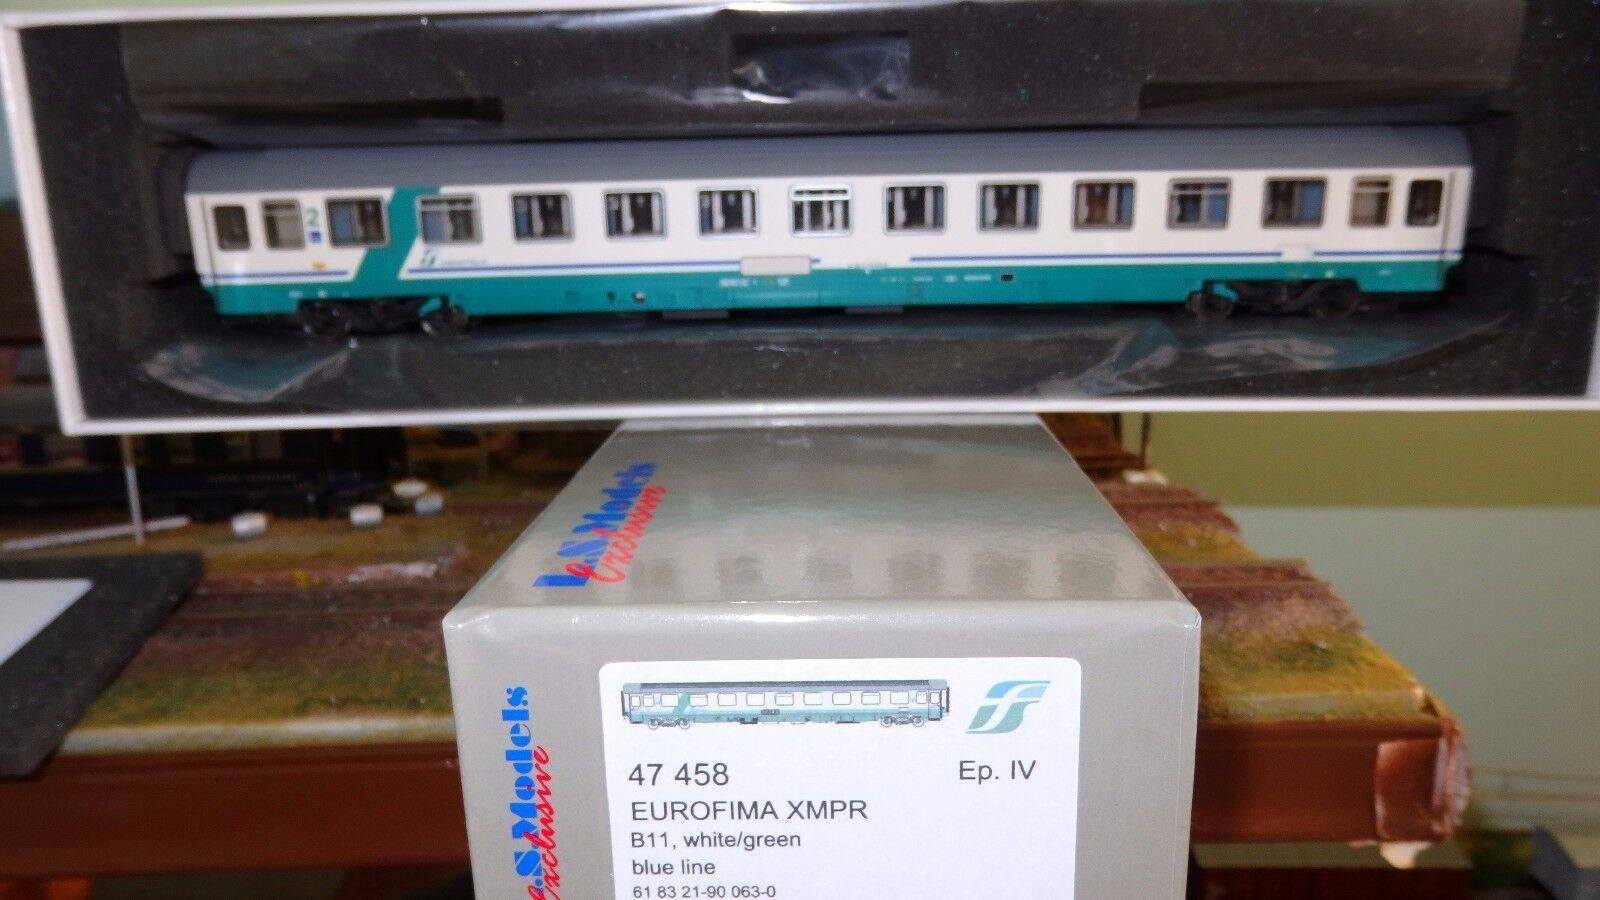 LS MODELS 47458 UIC-Z Eurofima 2 cl. XMPR FS Trenitalia, fascia obliqua green,FS